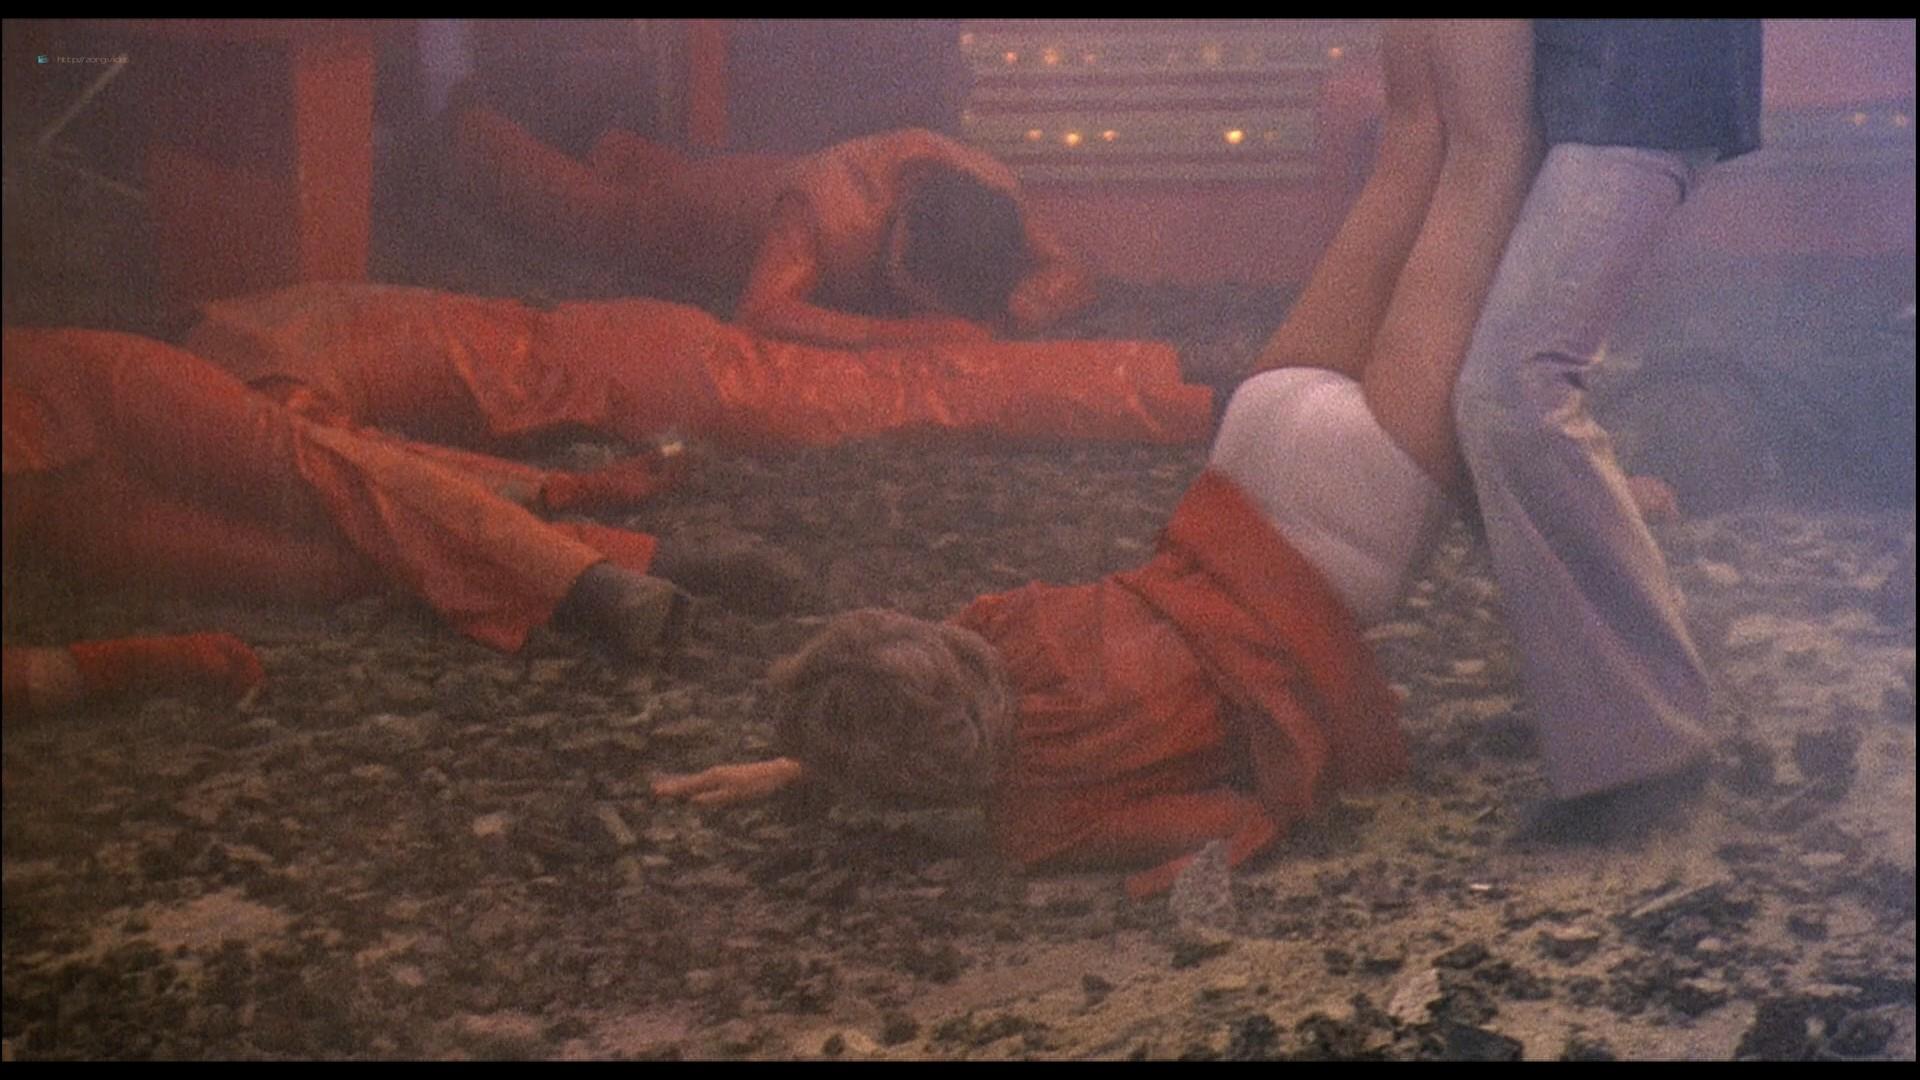 Cheré Bryson busty see through Andrea Howard, Pamela Hensley hot - The Nude Bomb (1980) HD 1080p BluRay (2)